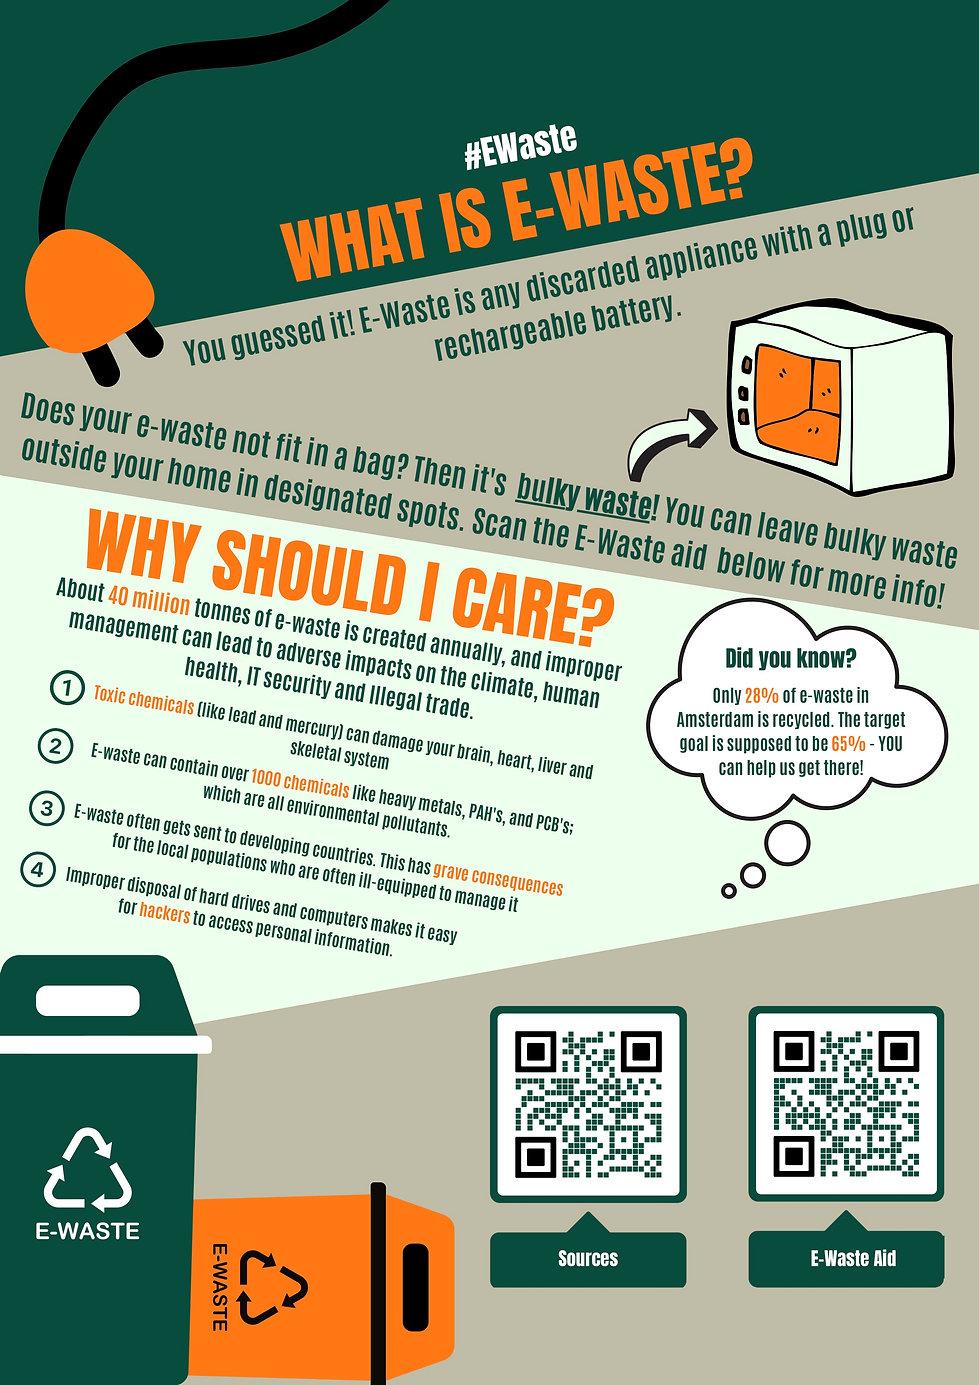 Amsterdam E-Waste Guide2.jpg